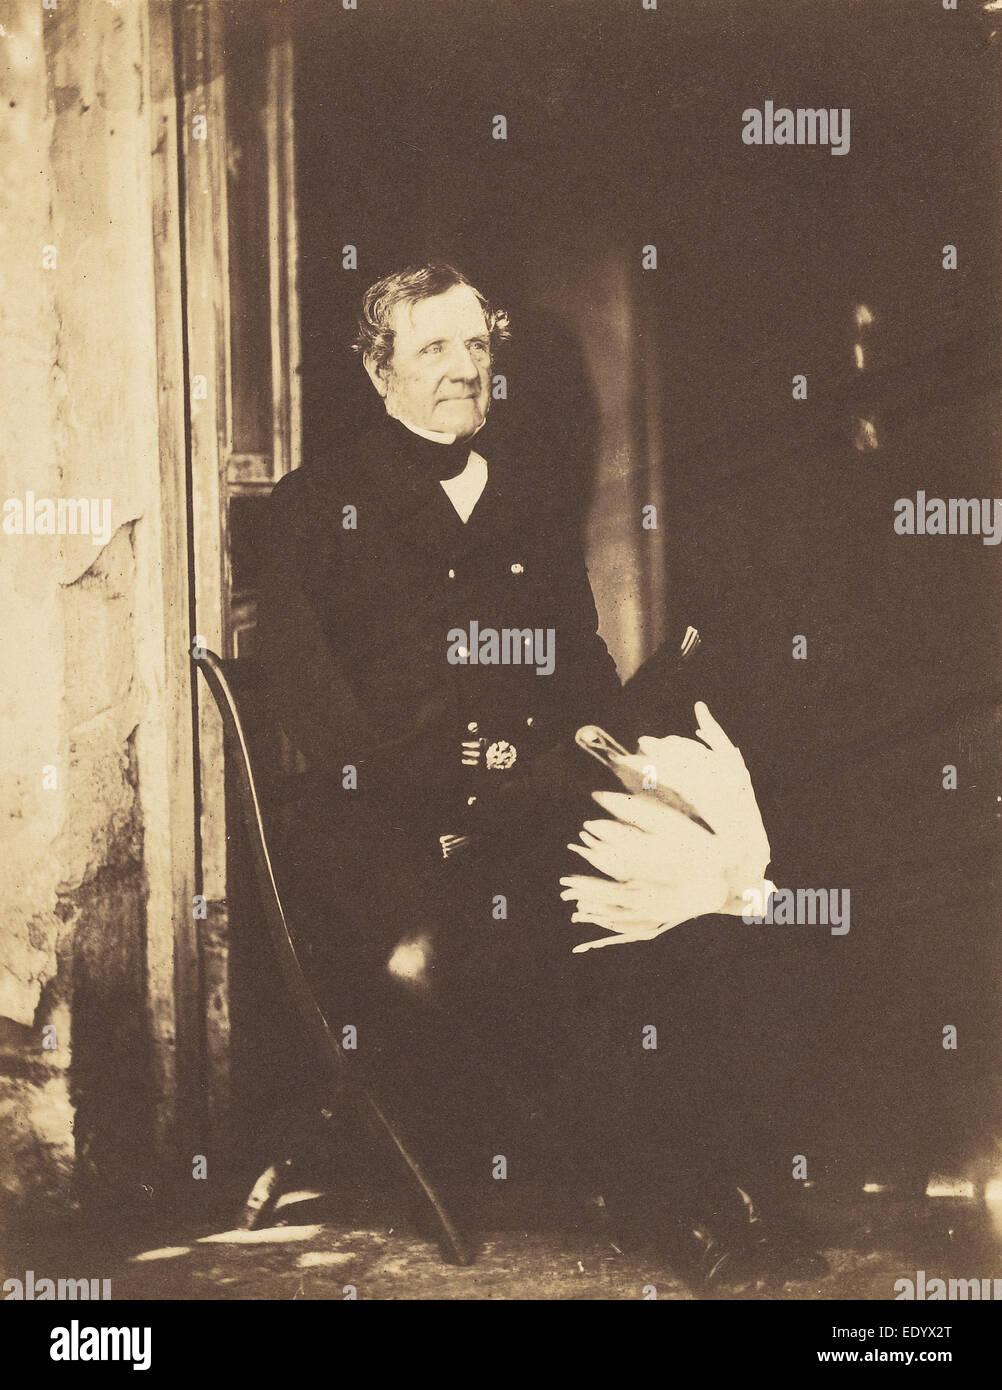 Field Marshall Lord Raglan; Roger Fenton, English, 1819 - 1869; Ukraine, Crimea, Europe; June 4, 1855; Salted paper - Stock Image